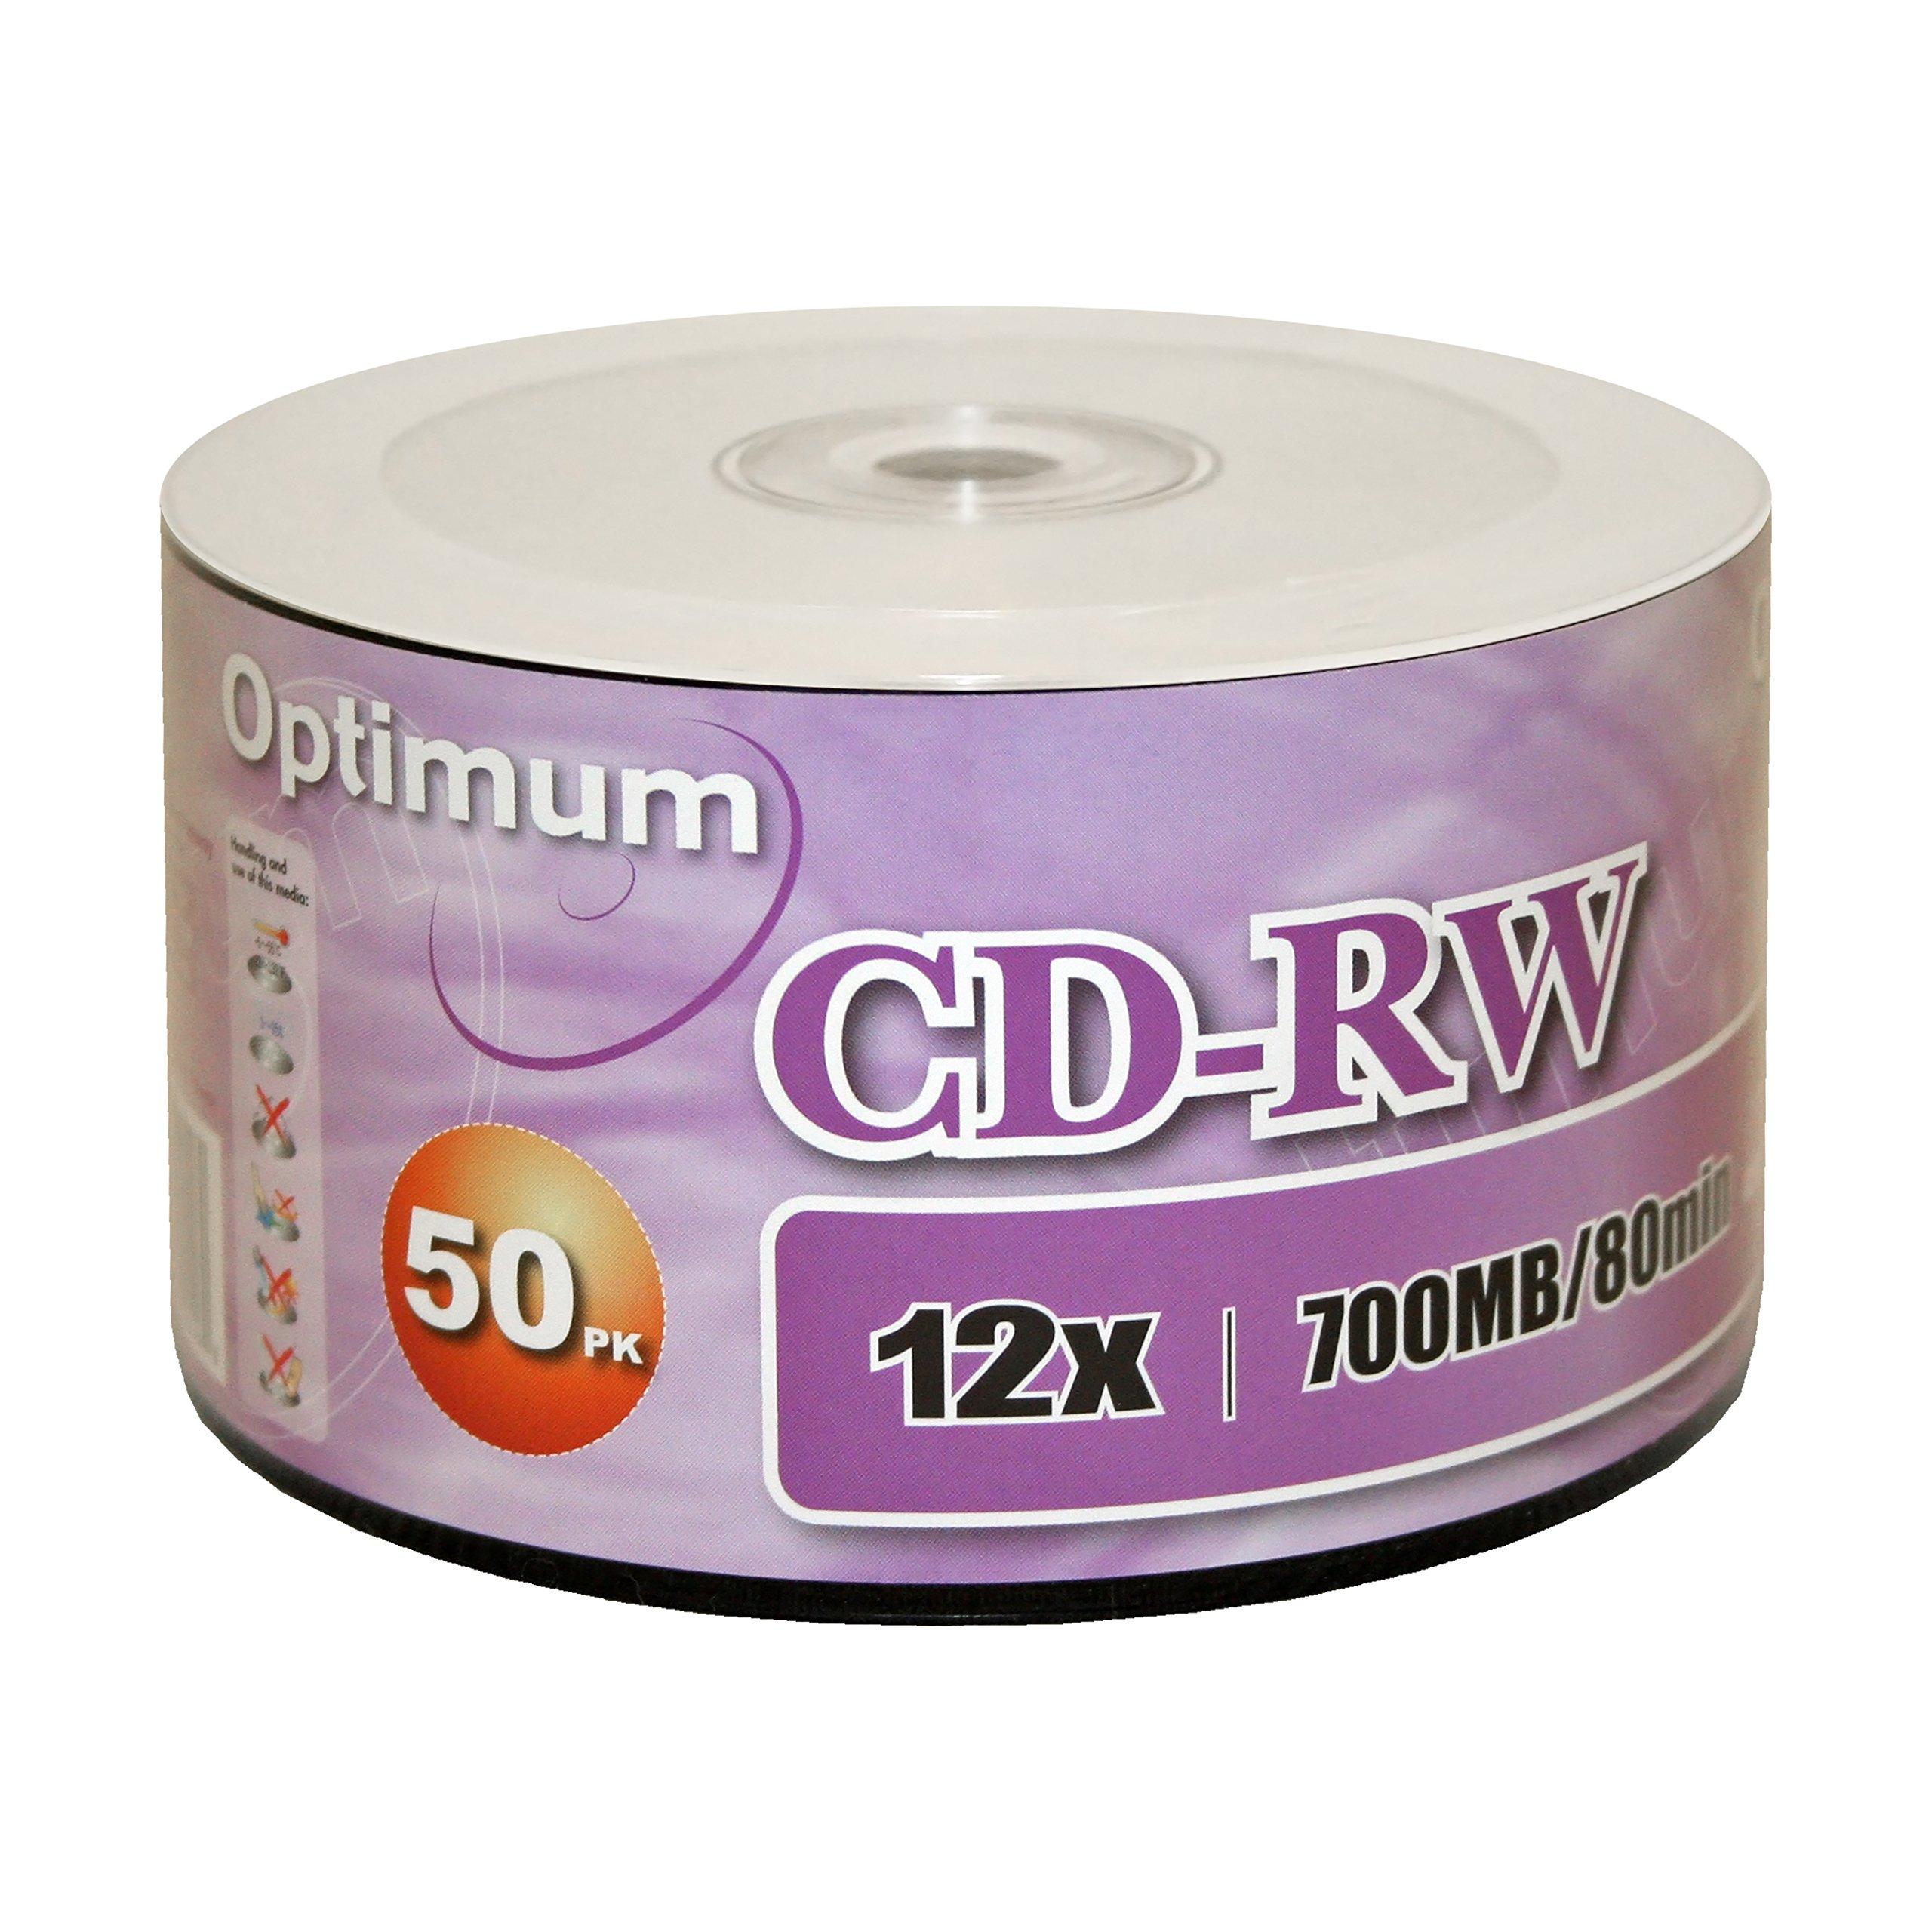 Optimum CD-RW 12x 700MB / 80min Logo Top 50pk